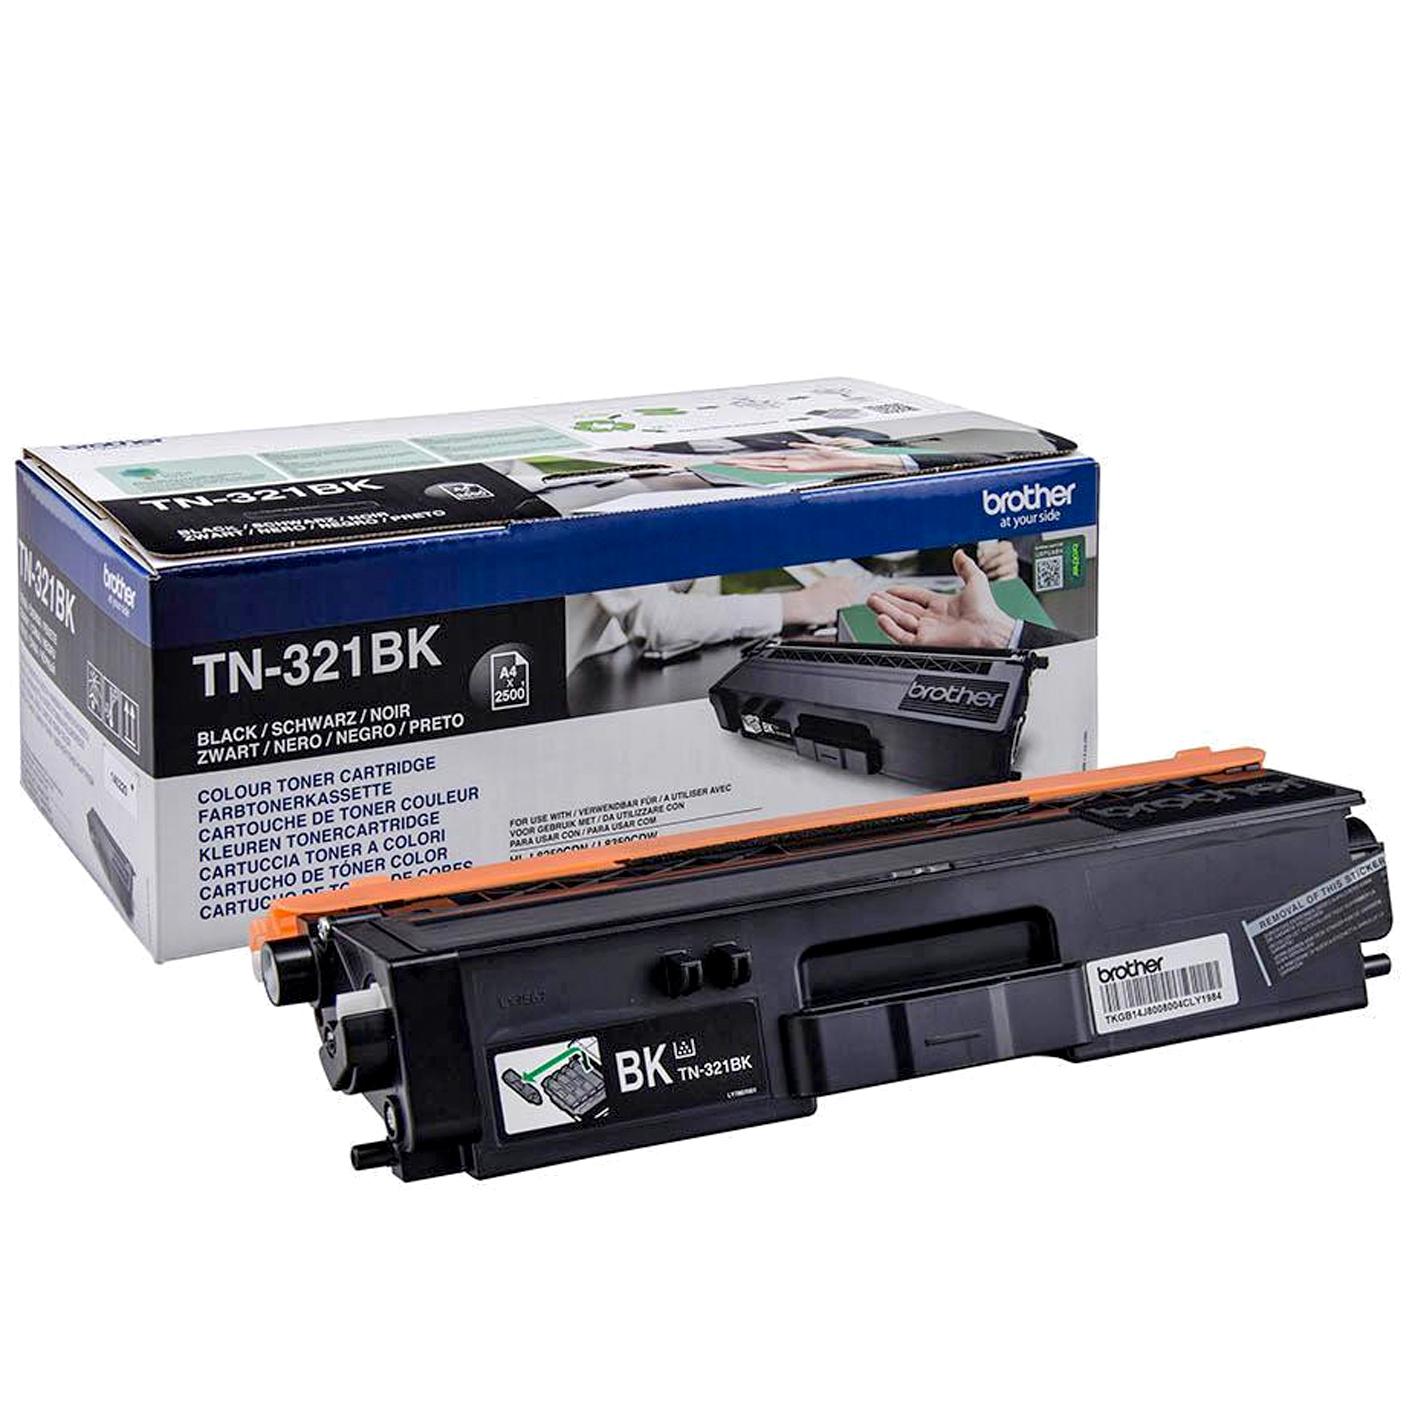 Brother TN321BK - Sort - original - tonerpatron - for Brother DCP-L8400, DCP-L8450, MFC-L8650, MFC-L8850; HL-L8250, L8350